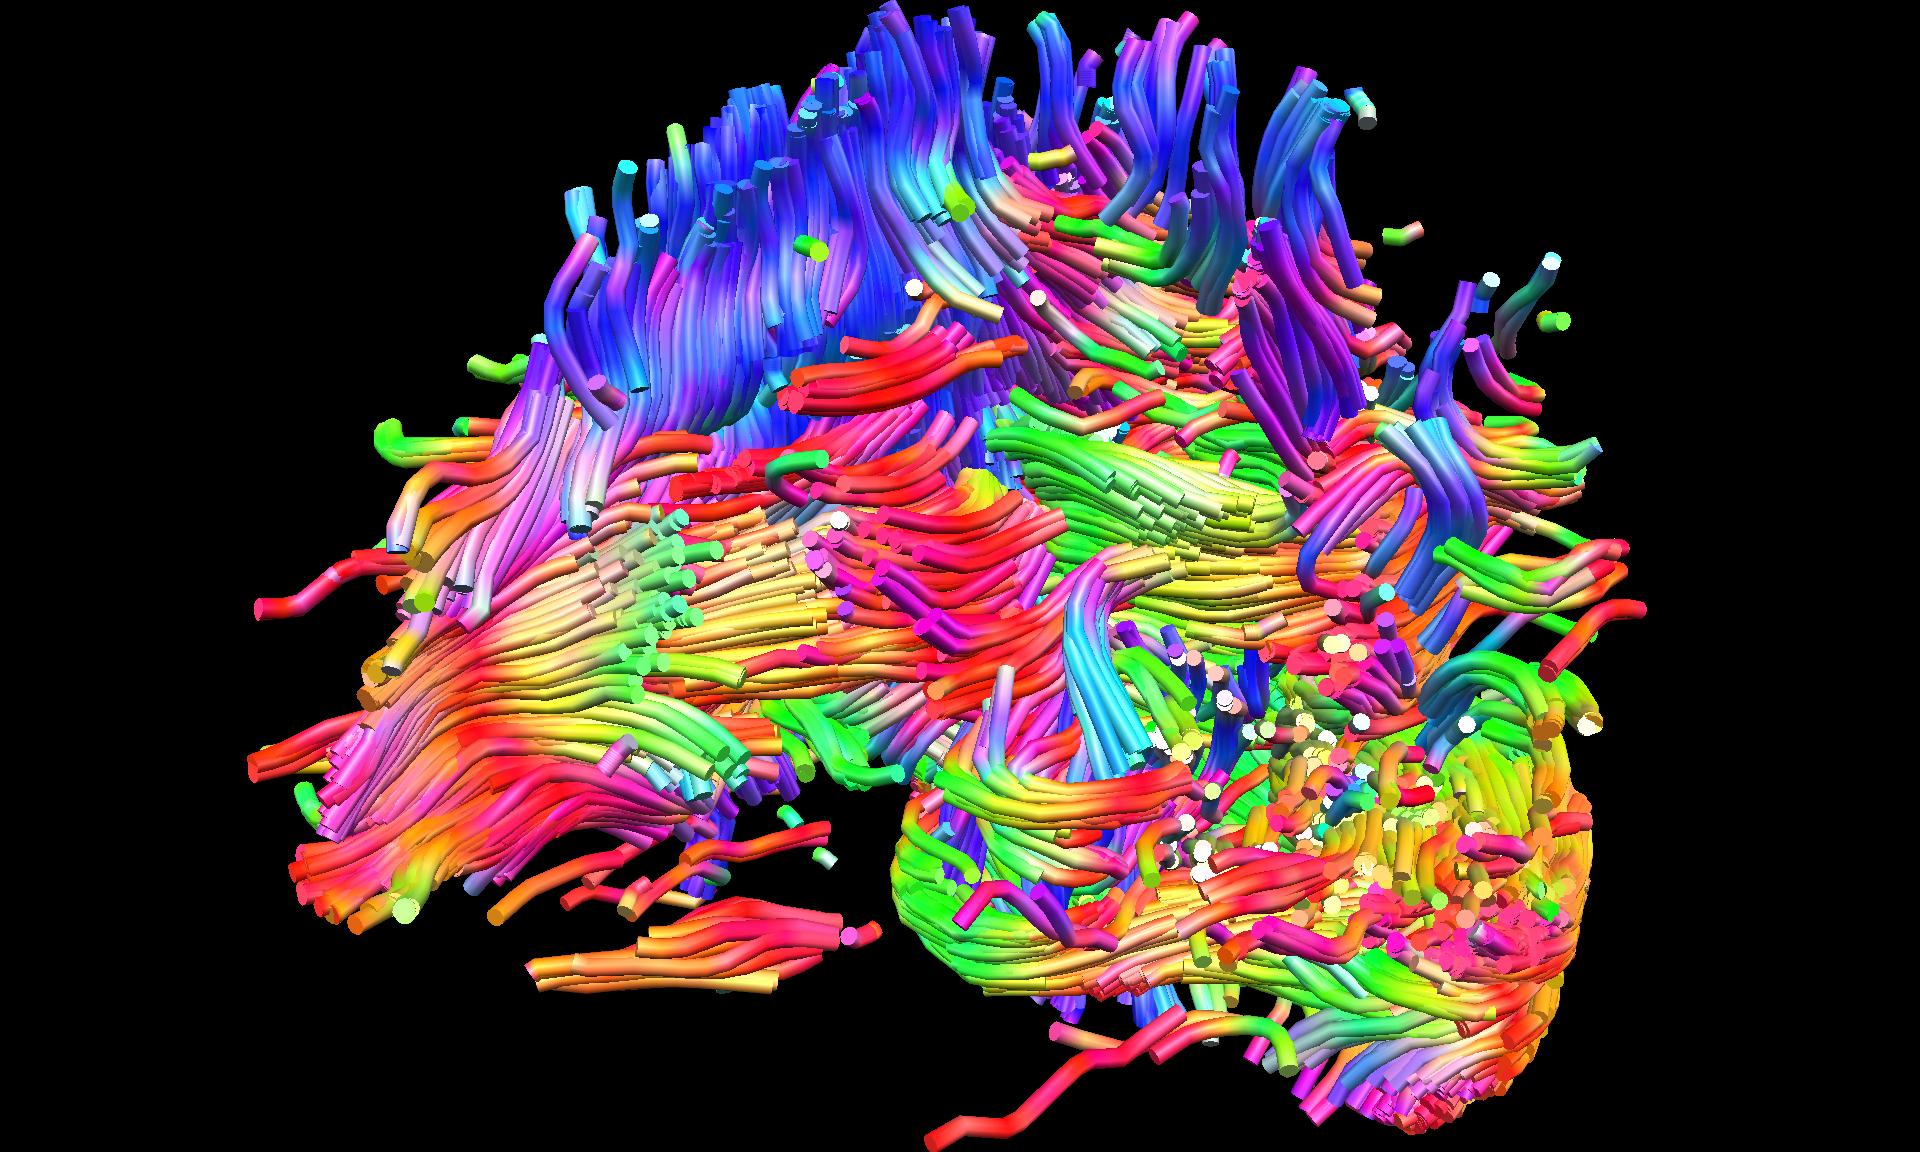 Fluid boundaries of perception - Lecture by Dr. Saskia Steinmann, Harvard Medical School